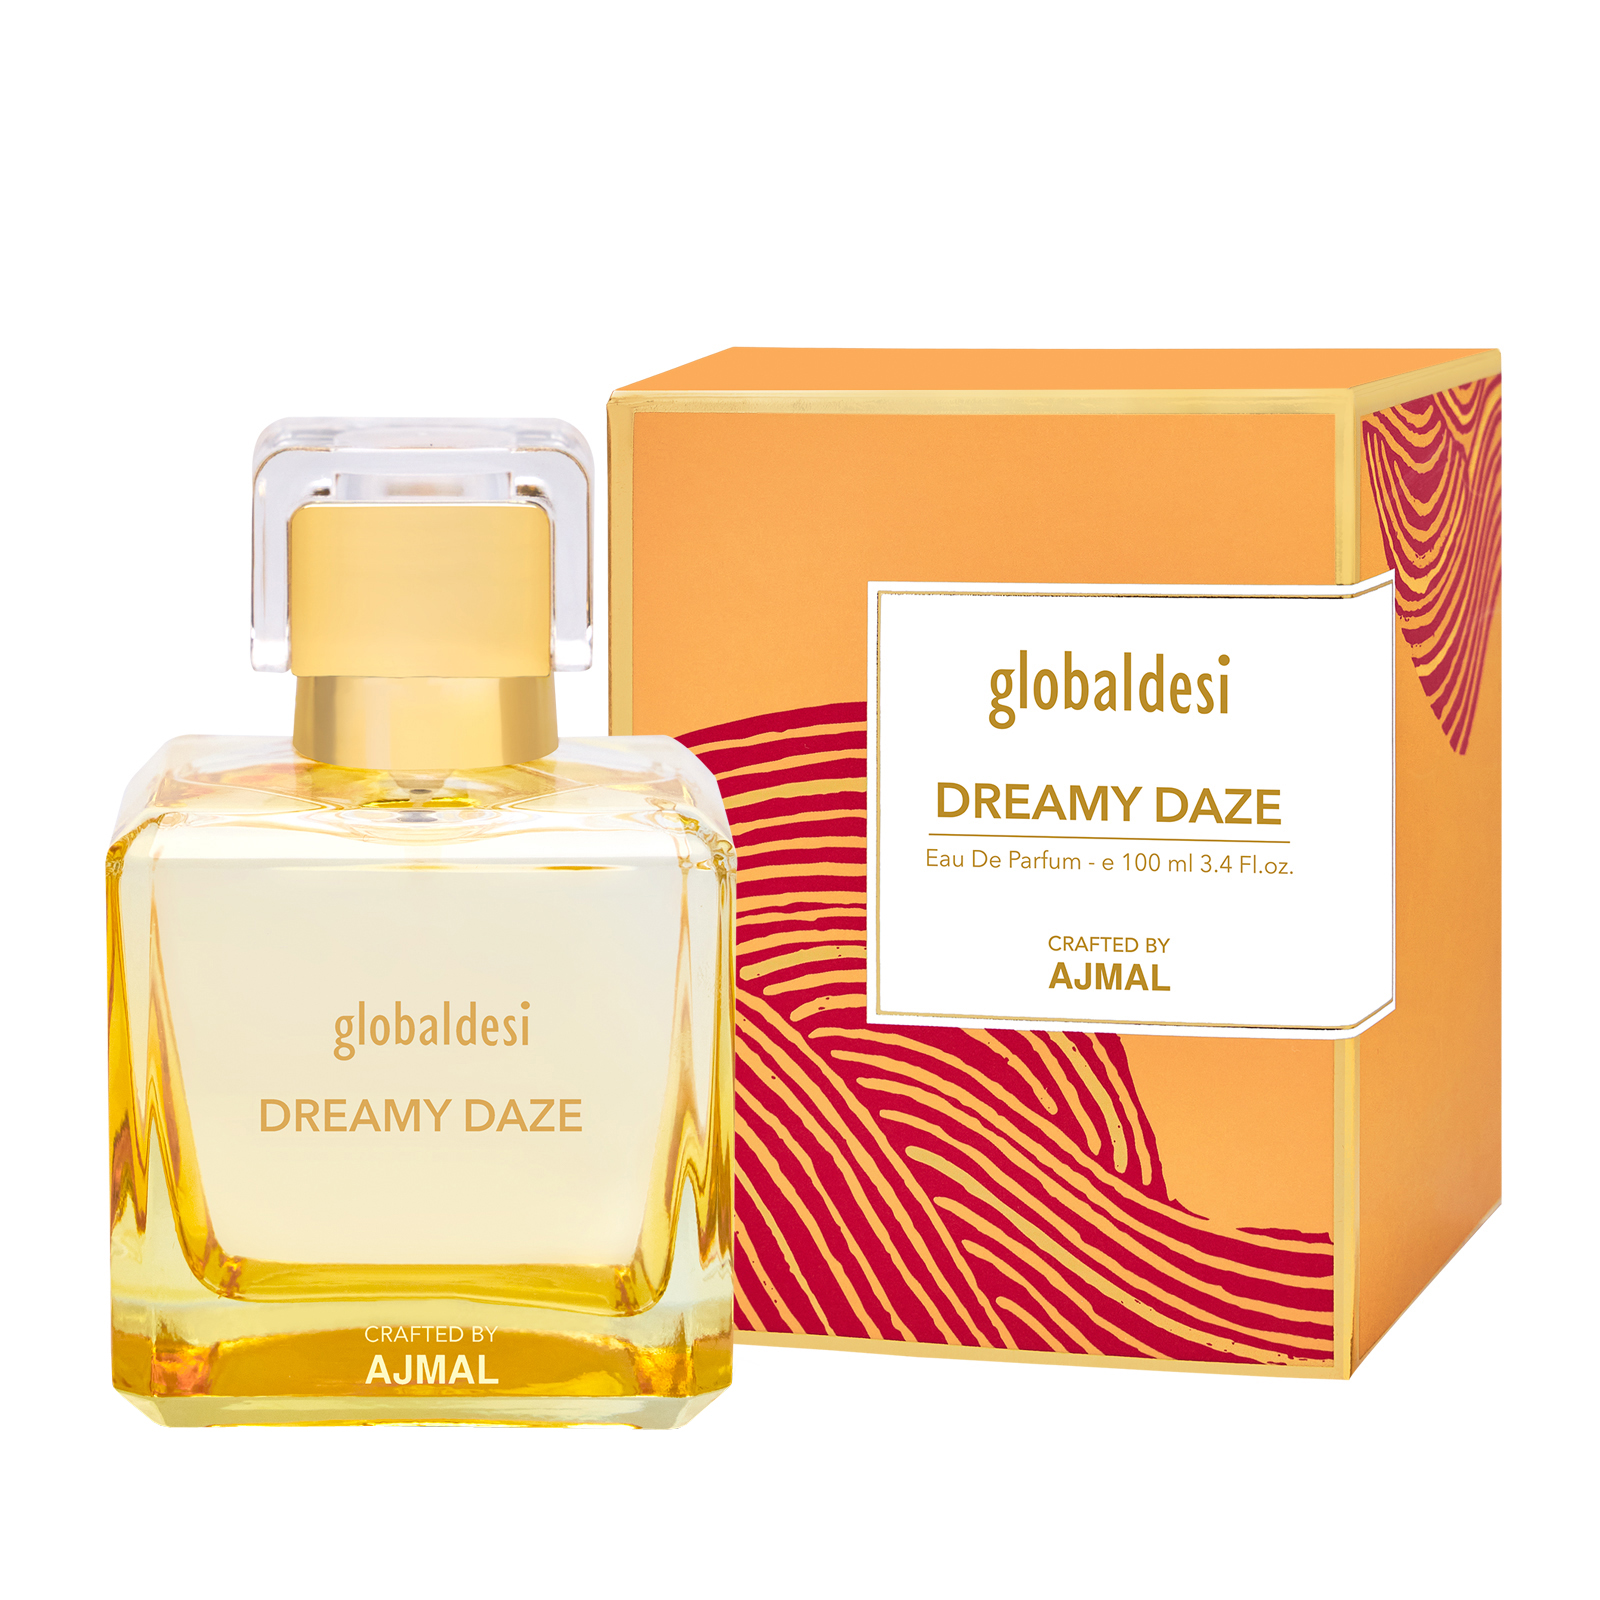 Global Desi Crafted By Ajmal | Global Desi Dreamy Daze Eau De Parfum 100ML for Women Crafted by Ajmal